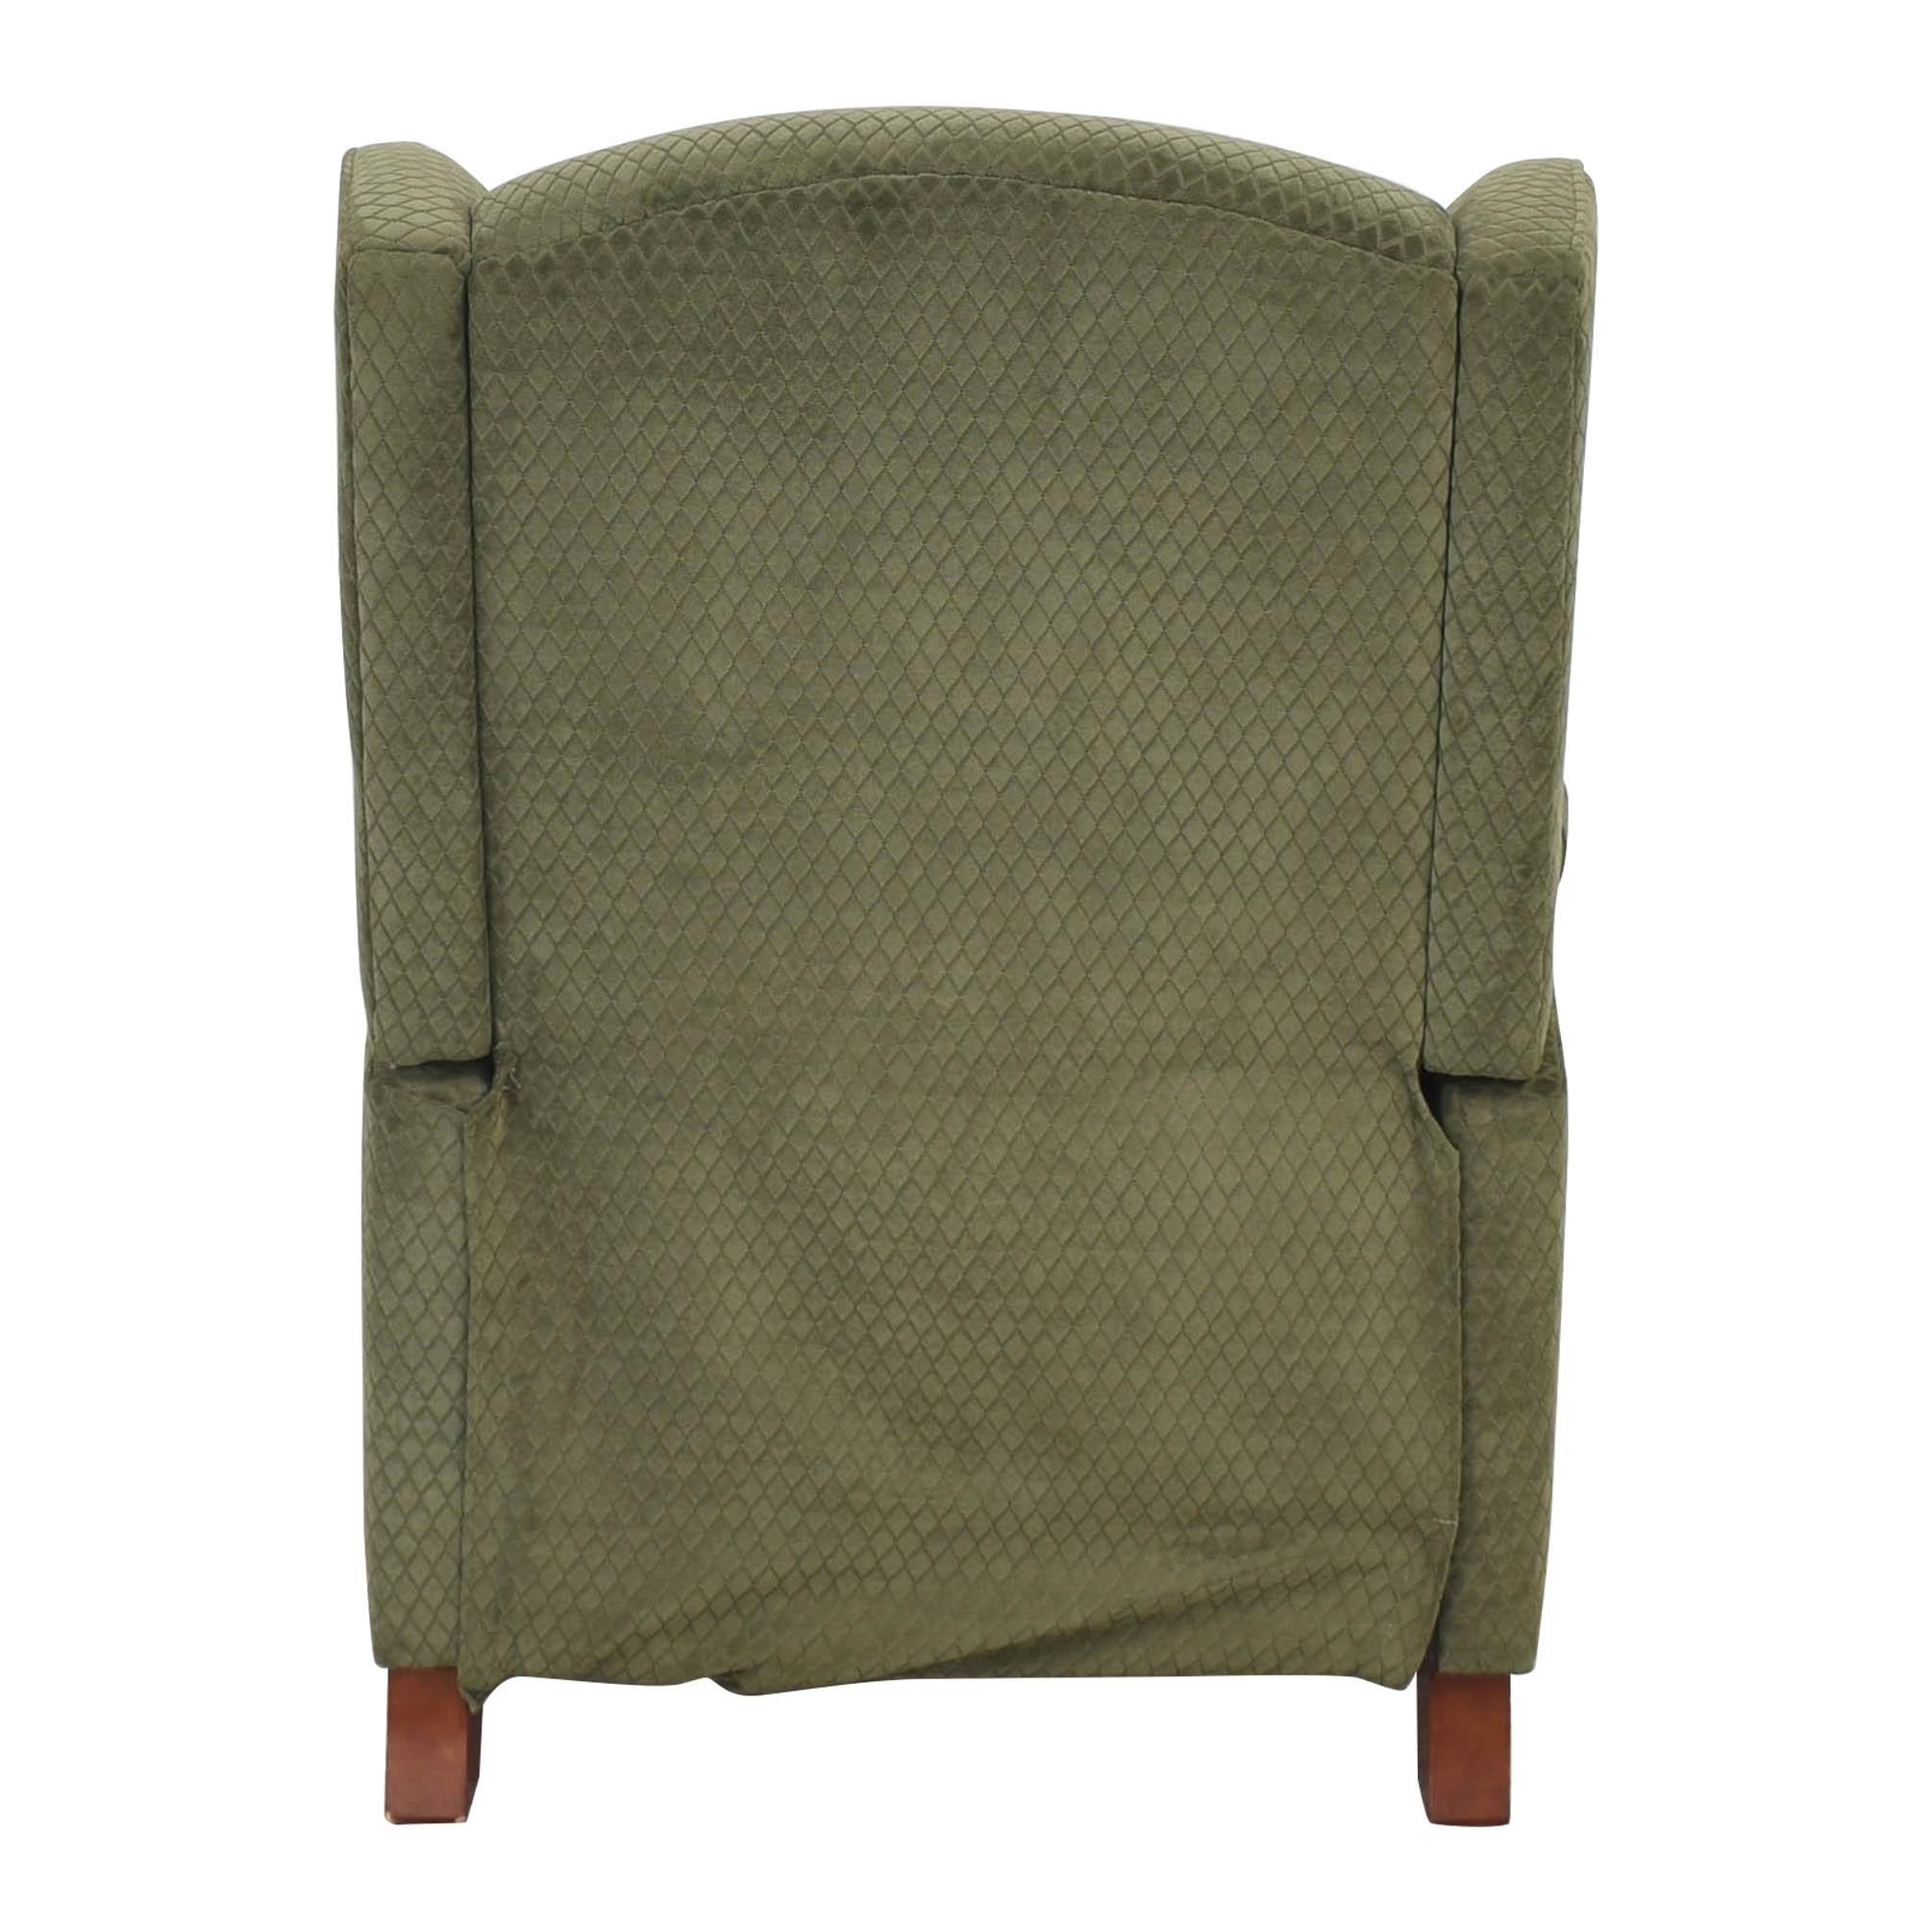 buy Macy's Edie Fabric Push Back Recliner Macy's